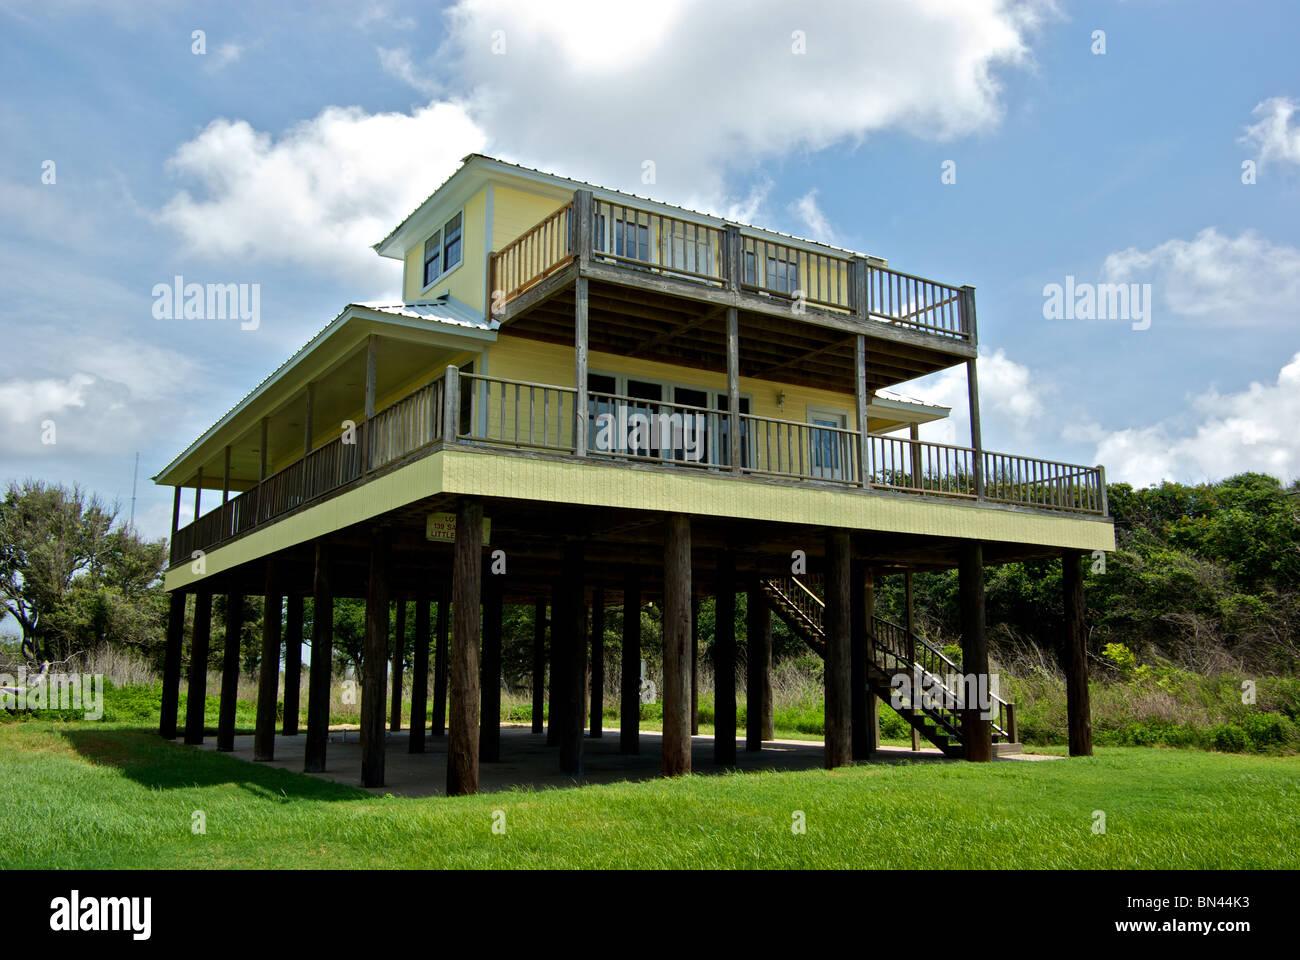 Florida houses on stilts house plan 2017 for Beach house plans usa